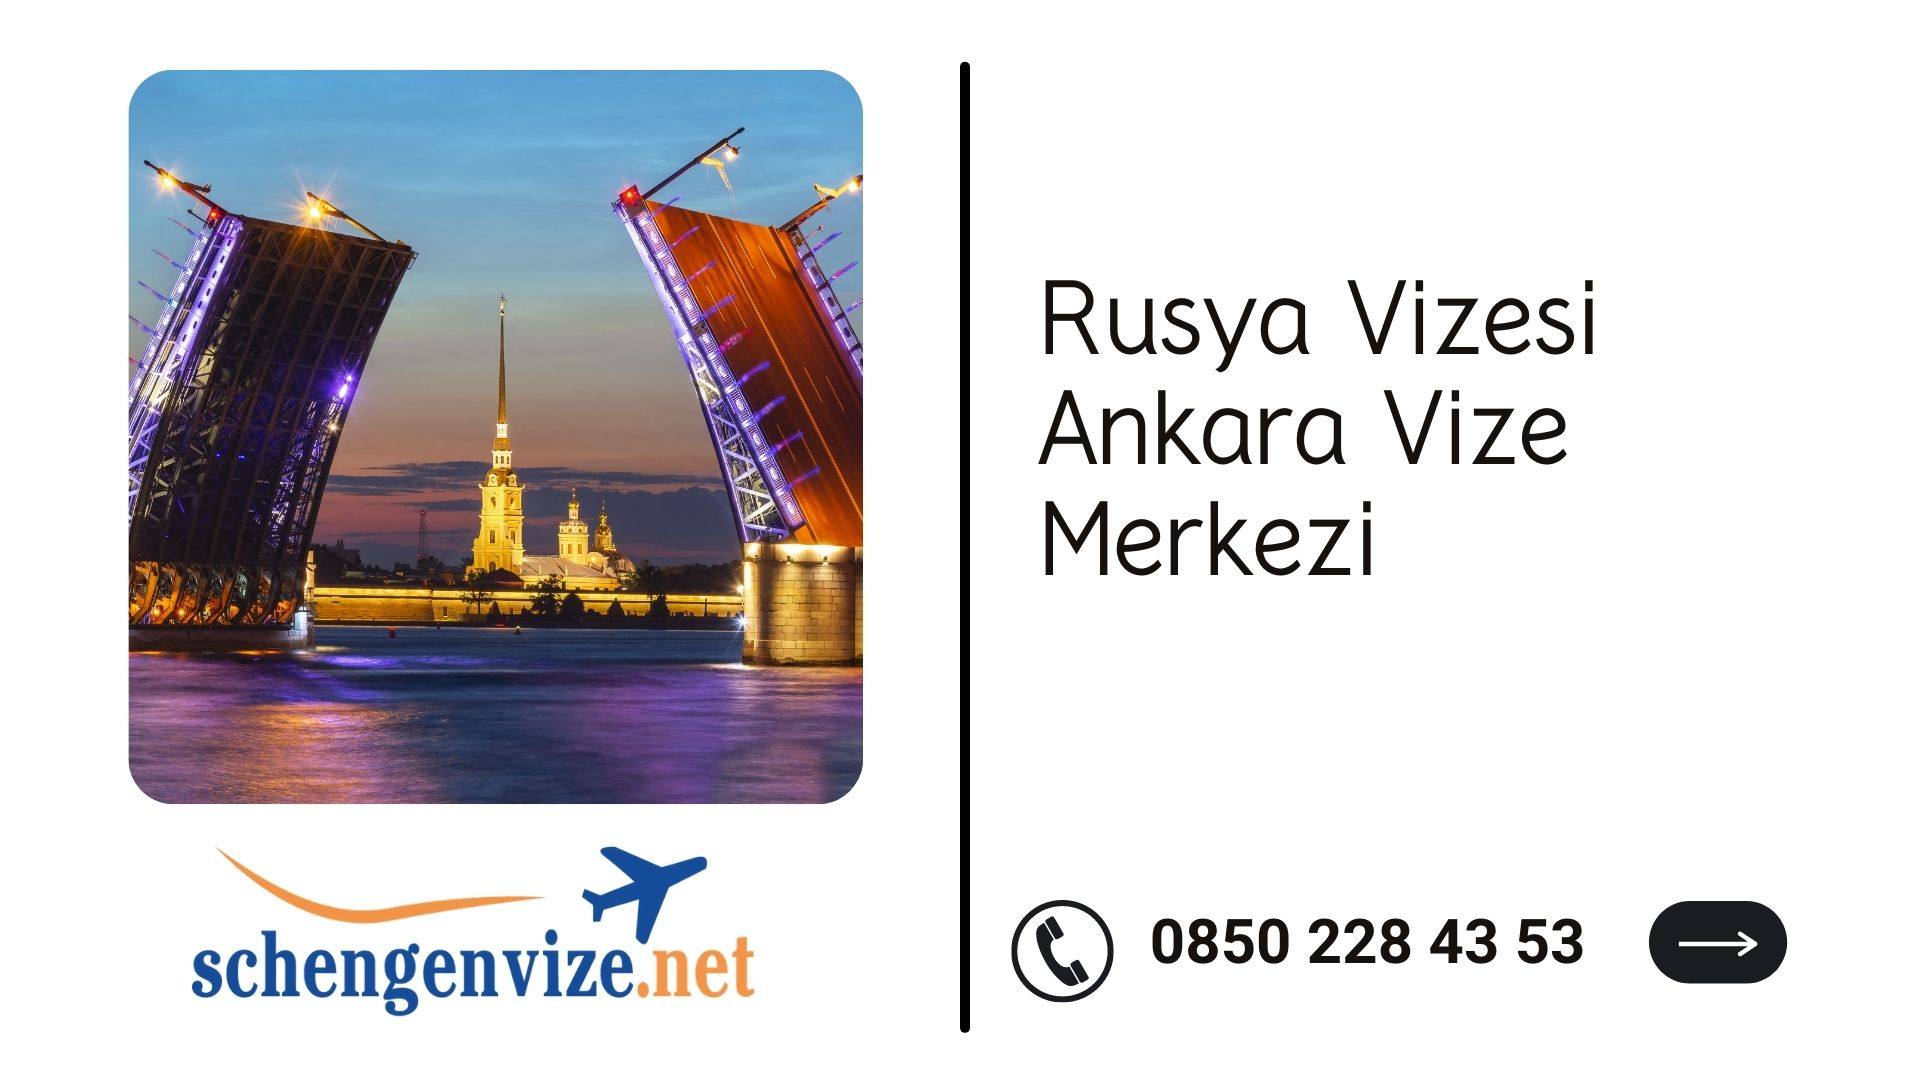 Rusya Vizesi Ankara Vize Merkezi